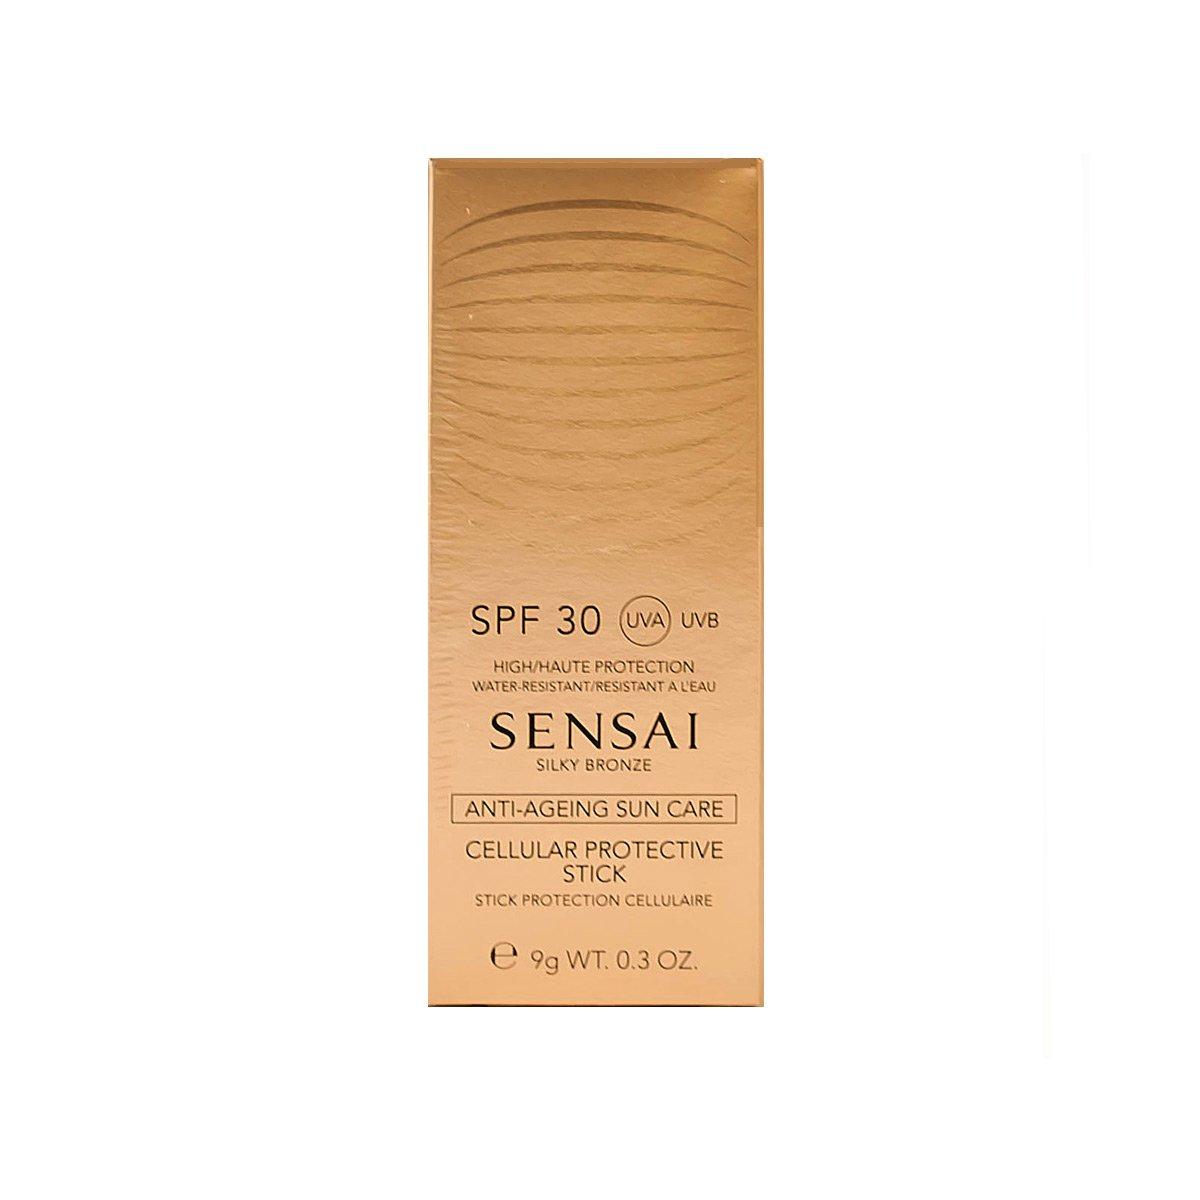 Sensai Silky Bronze Cellular Protective Stick SPF 30 - 9g/0.3oz Kanebo 4973167954386 45753_-9gr